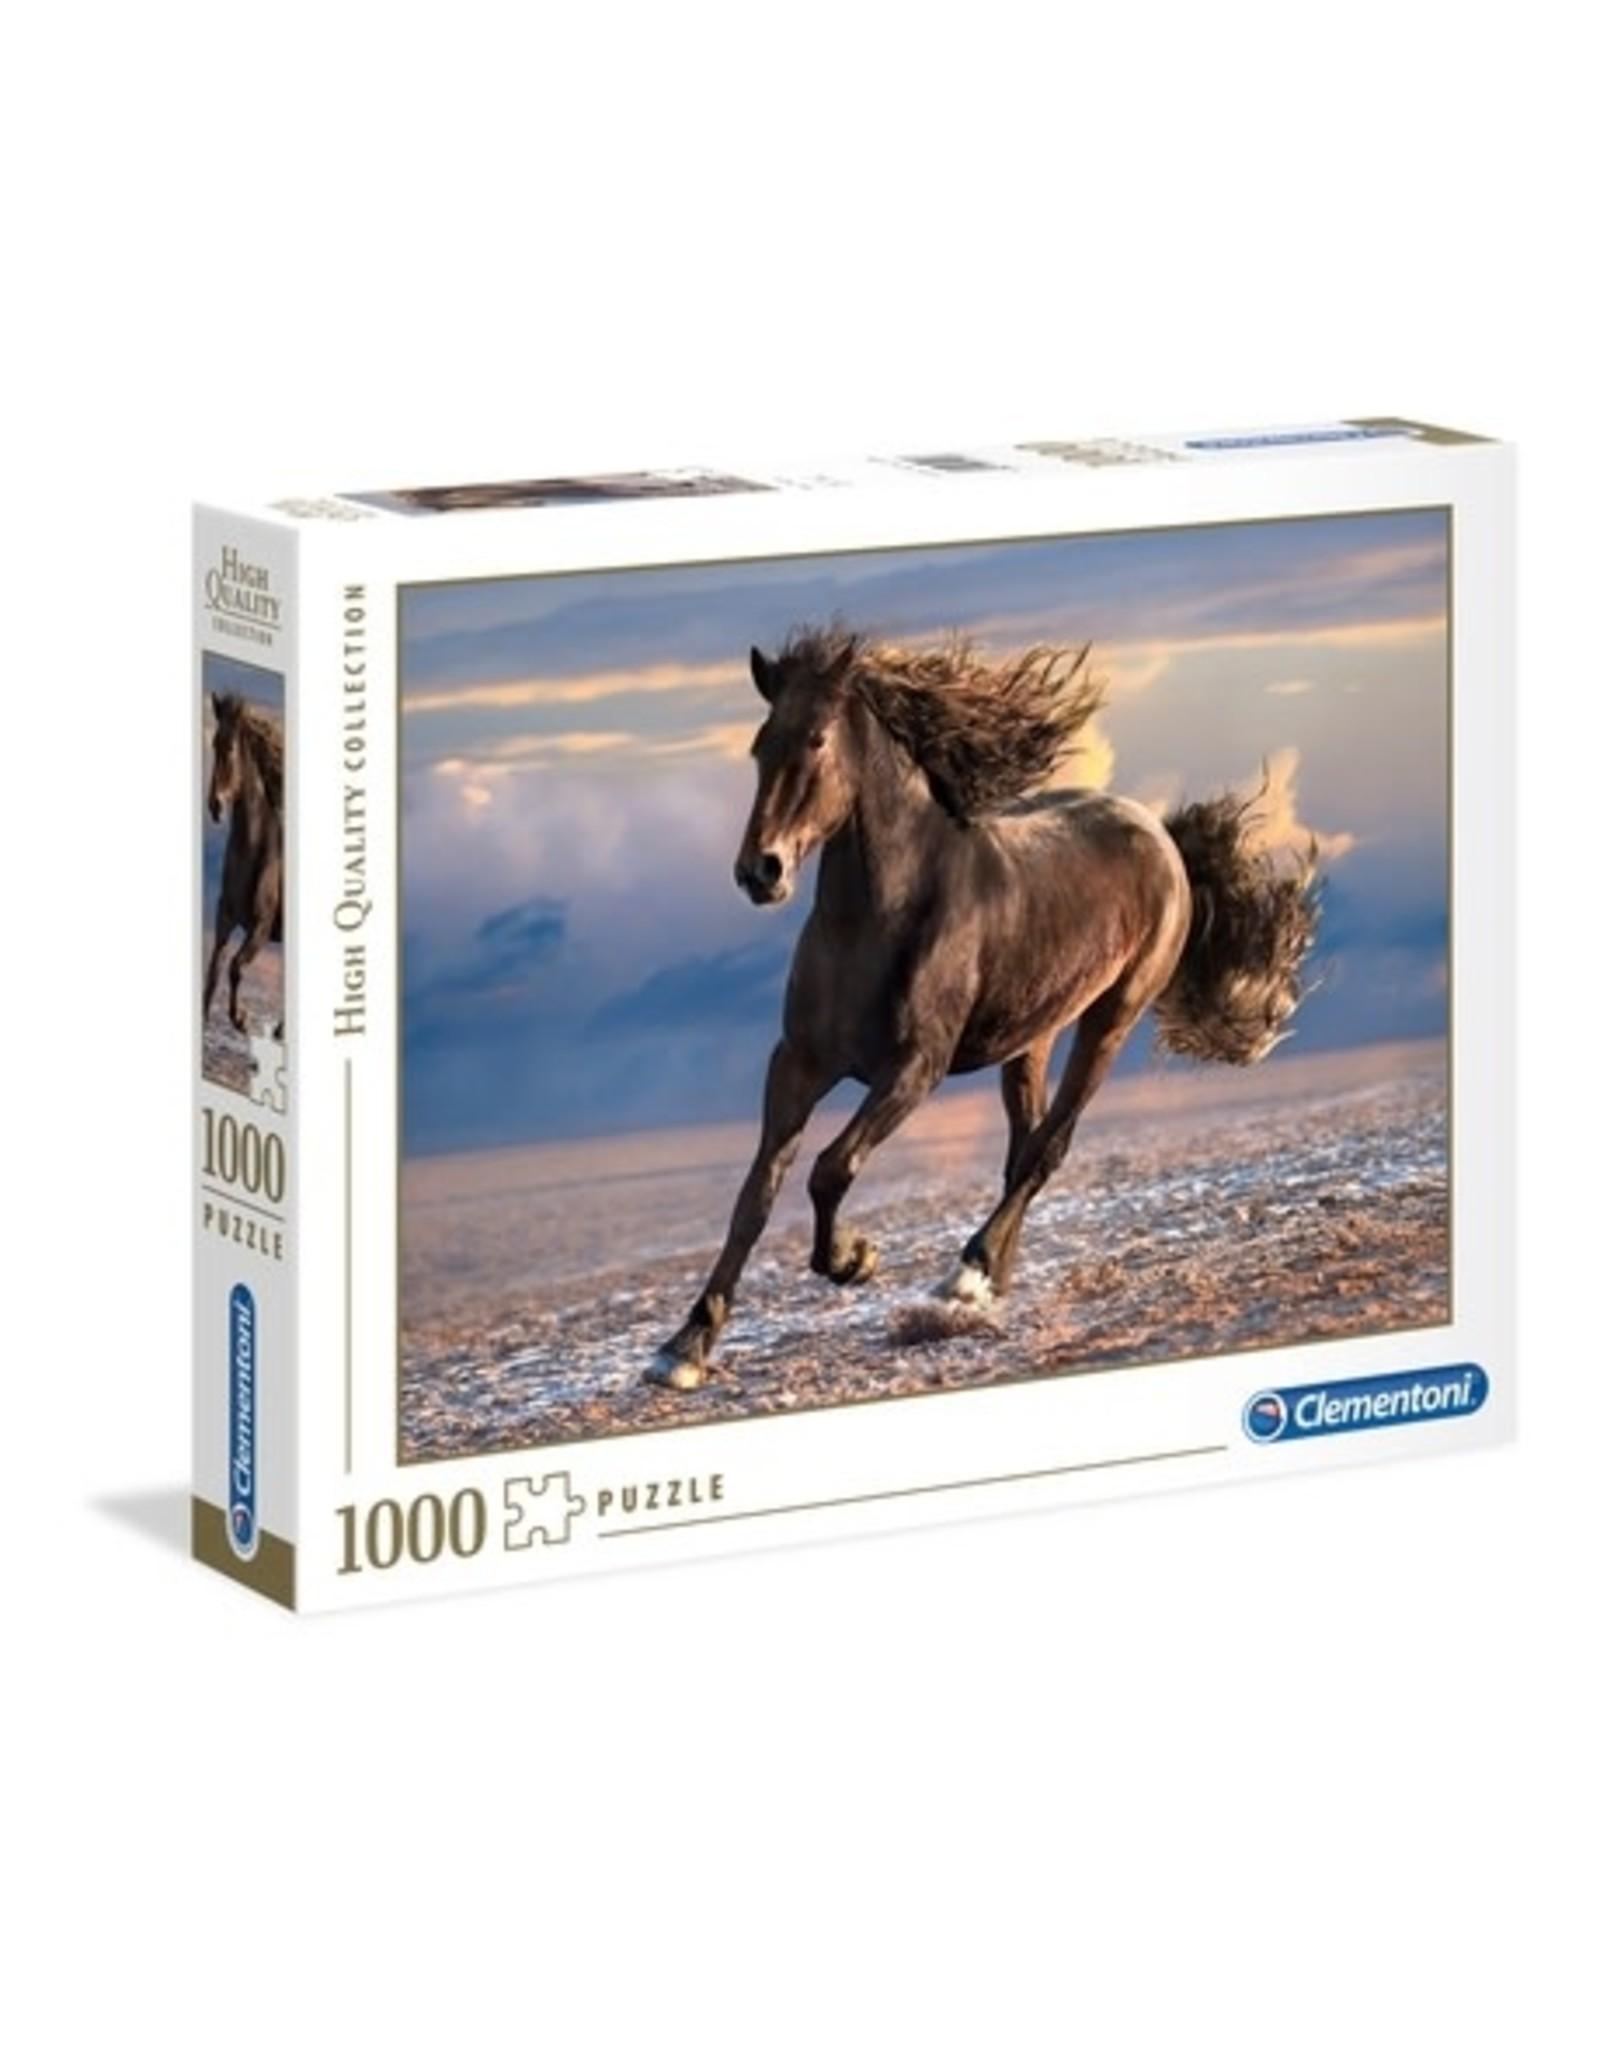 Clementoni Puzzles Free Horse, 1000 pc. puzzle - NEW